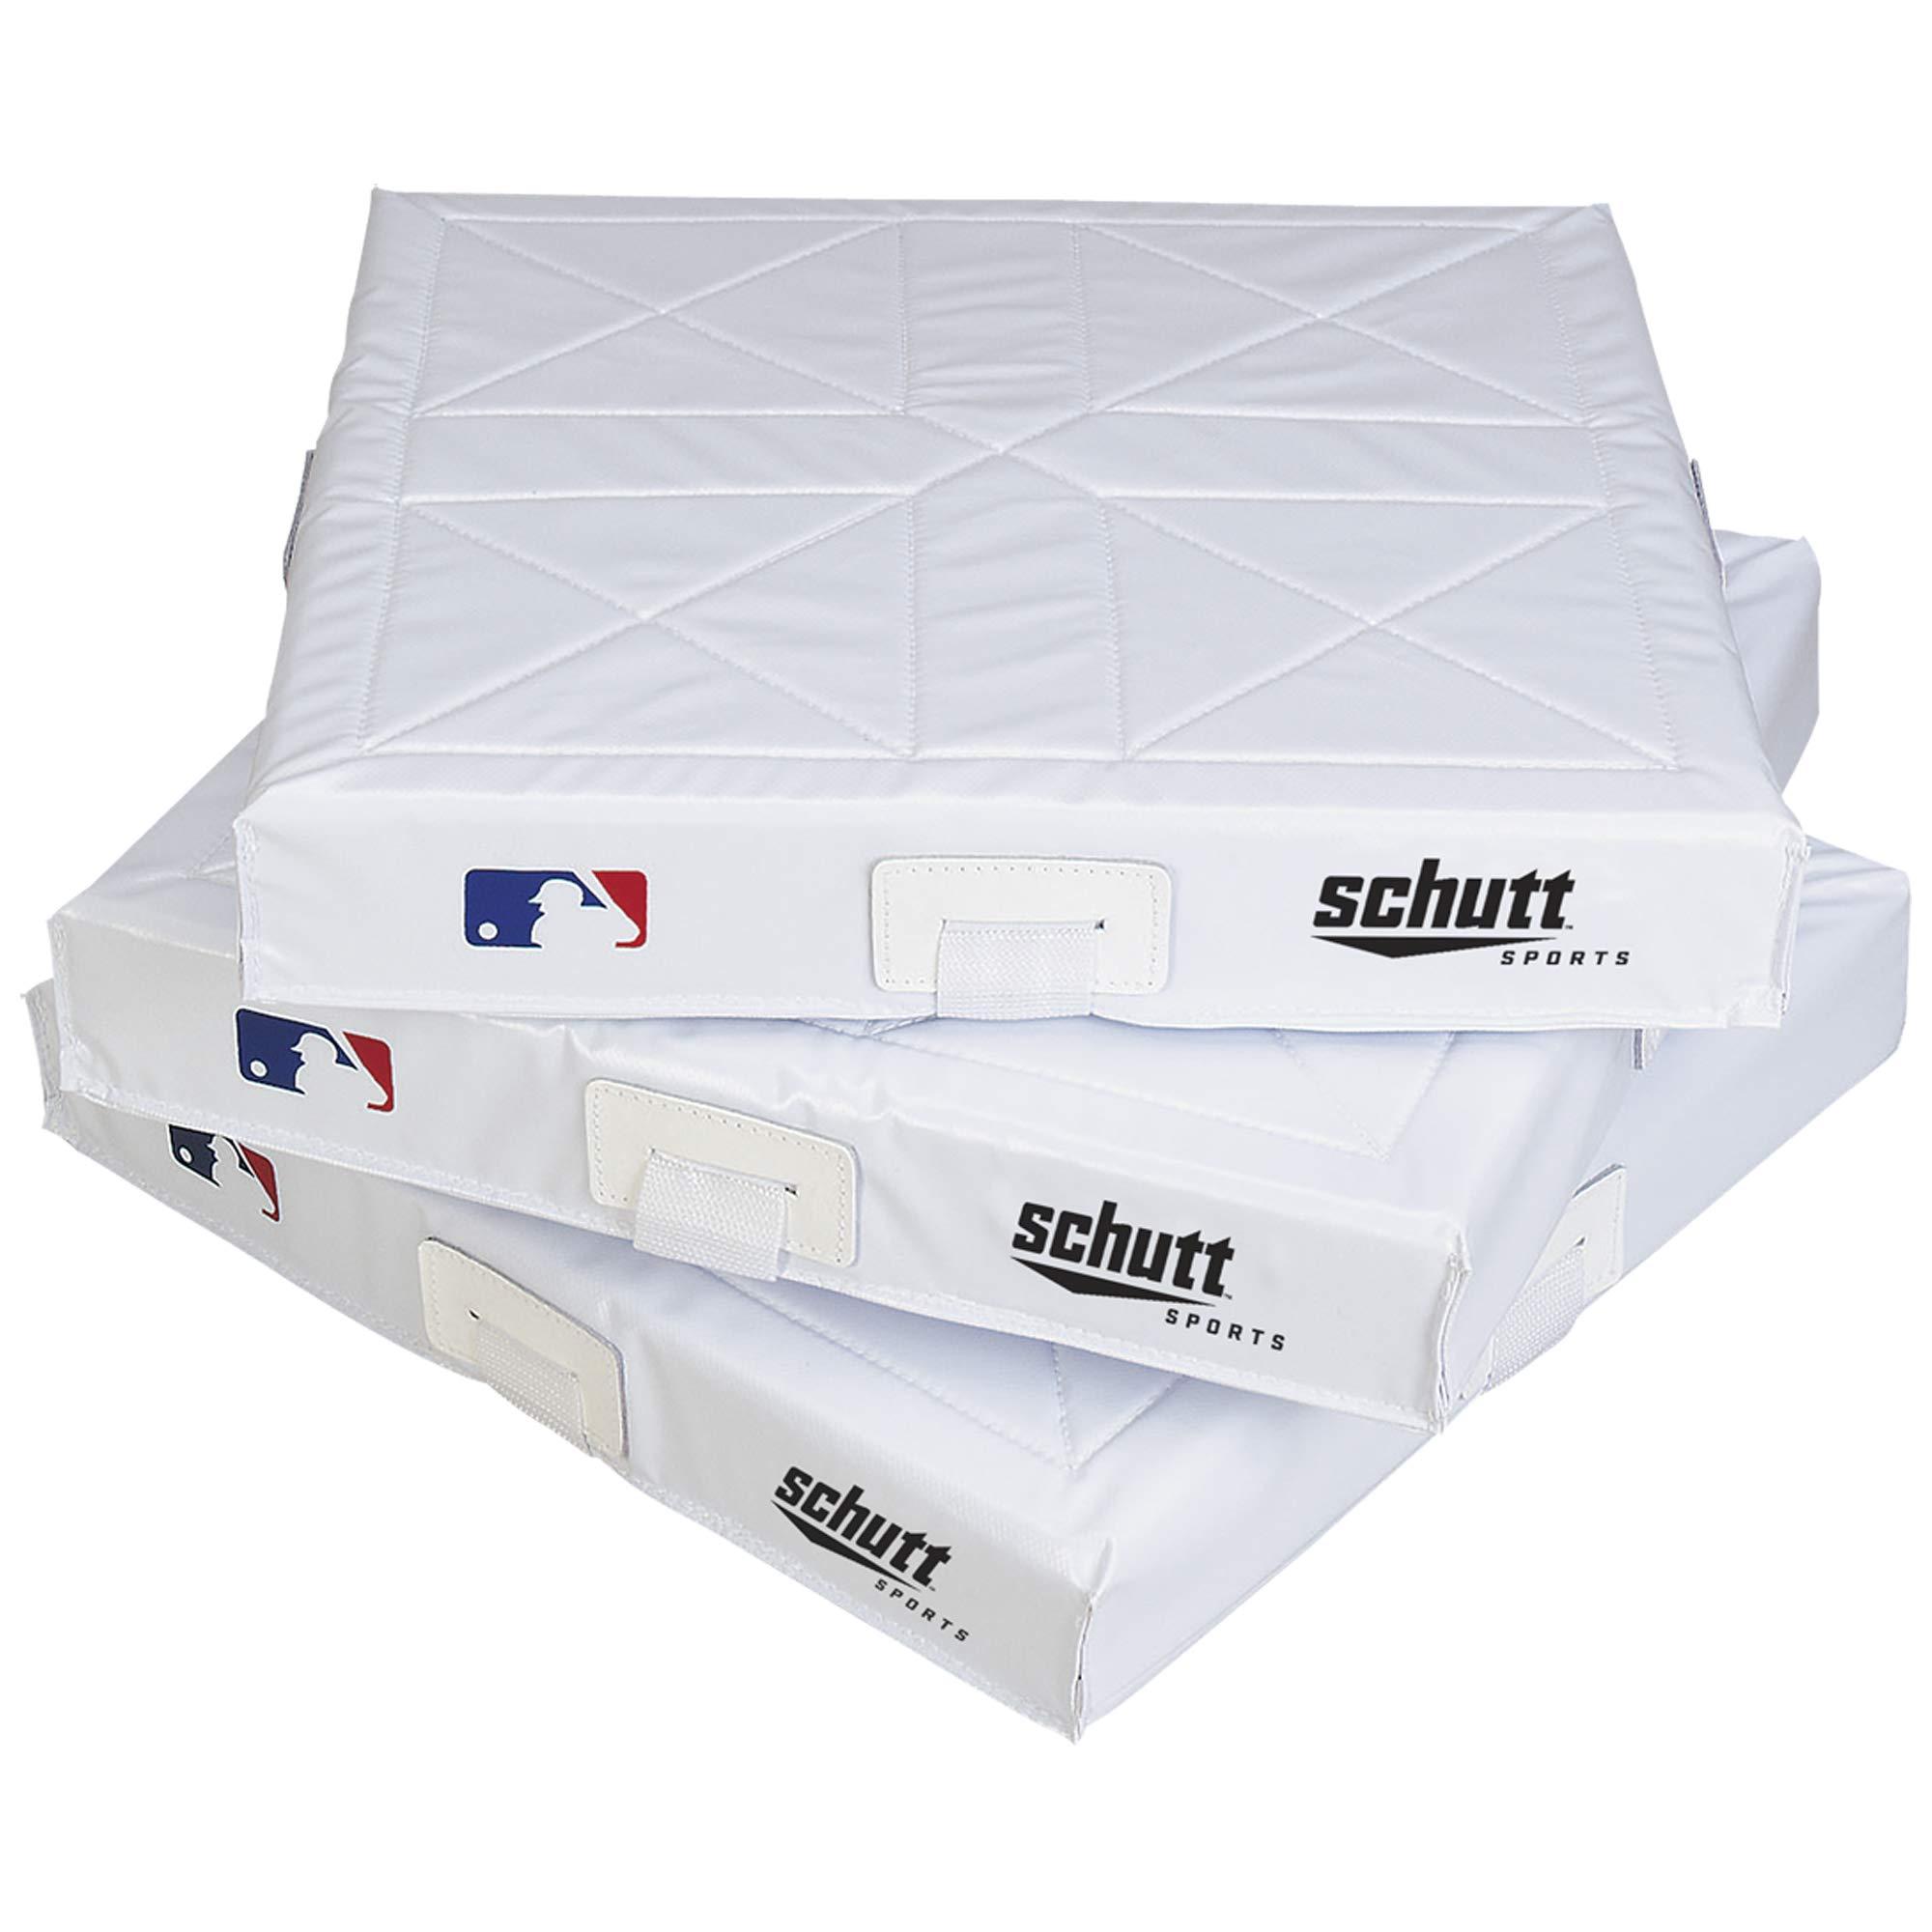 Schutt Economy Base Set, Adult by Schutt